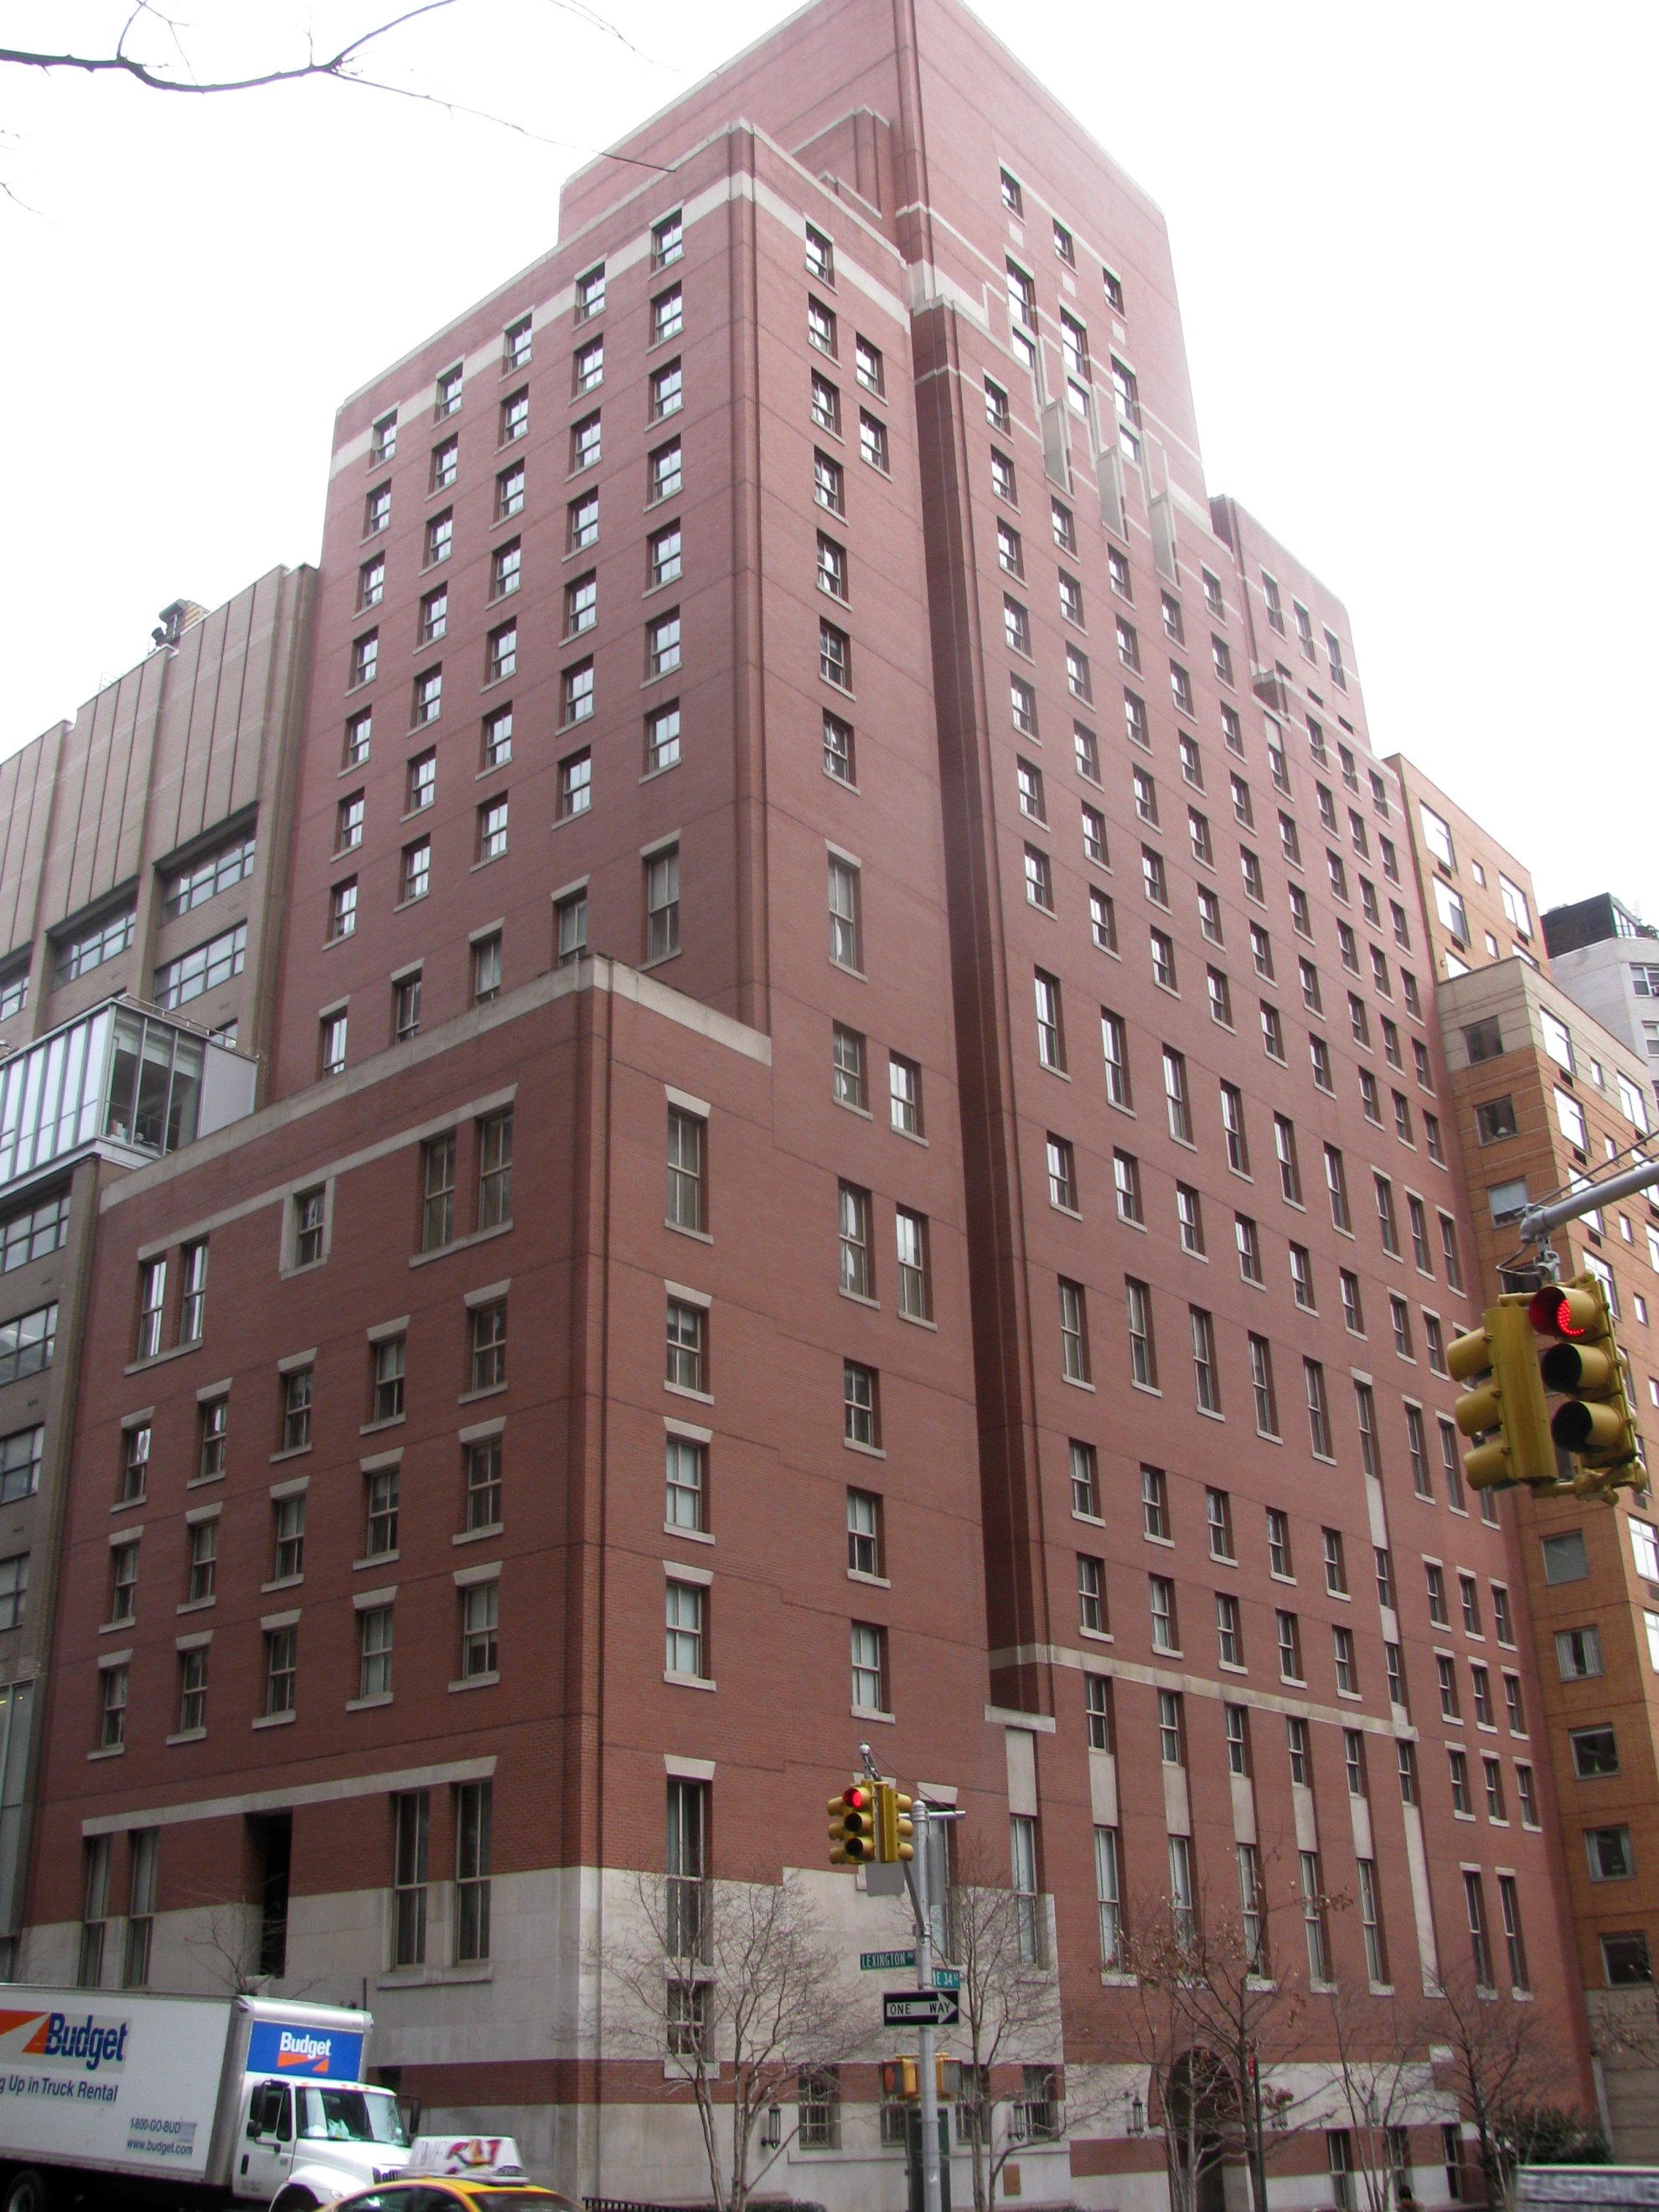 File:Opus Dei Headquarters (4334060263).jpg - Wikimedia Commons